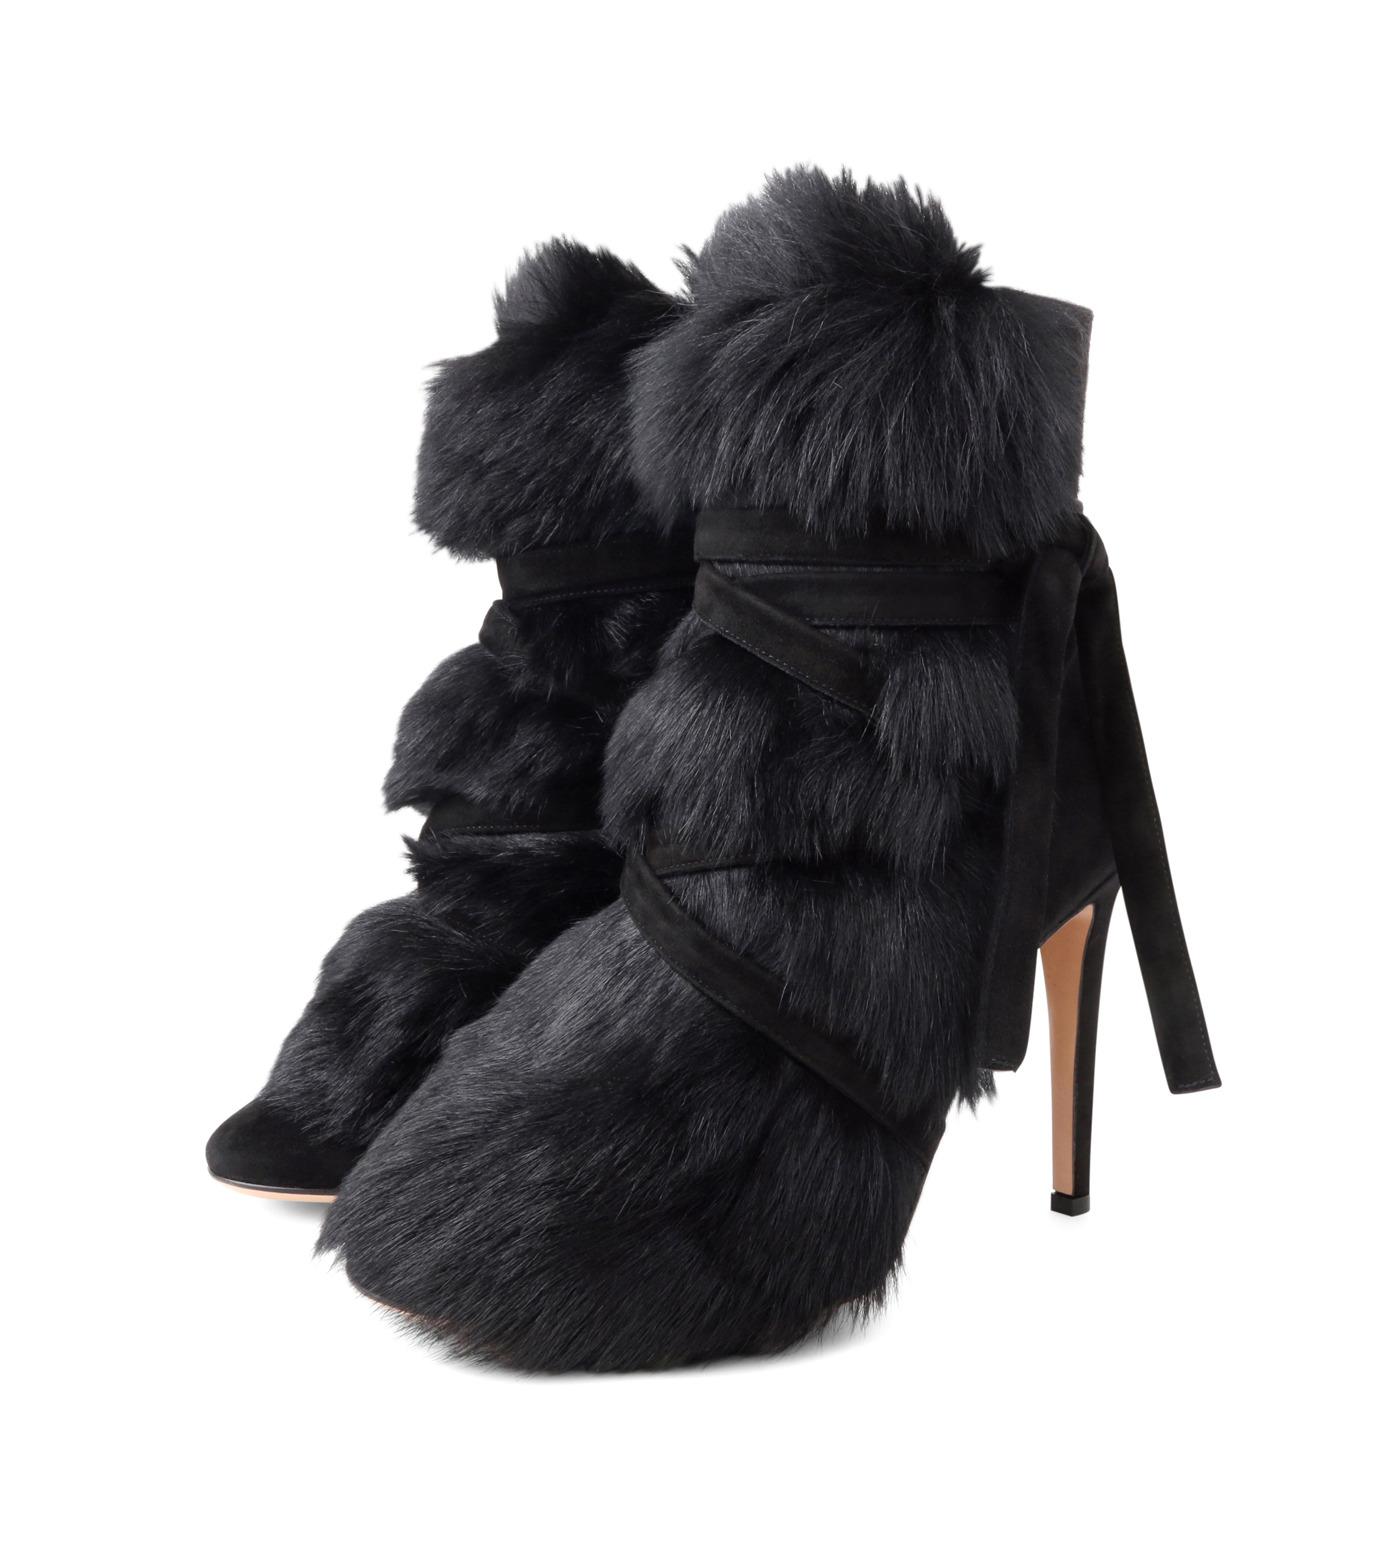 Gianvito Rossi(ジャンヴィト ロッシ)のShort Boots w/Goat Fur-BLACK(ブーツ/boots)-70469-13 拡大詳細画像3